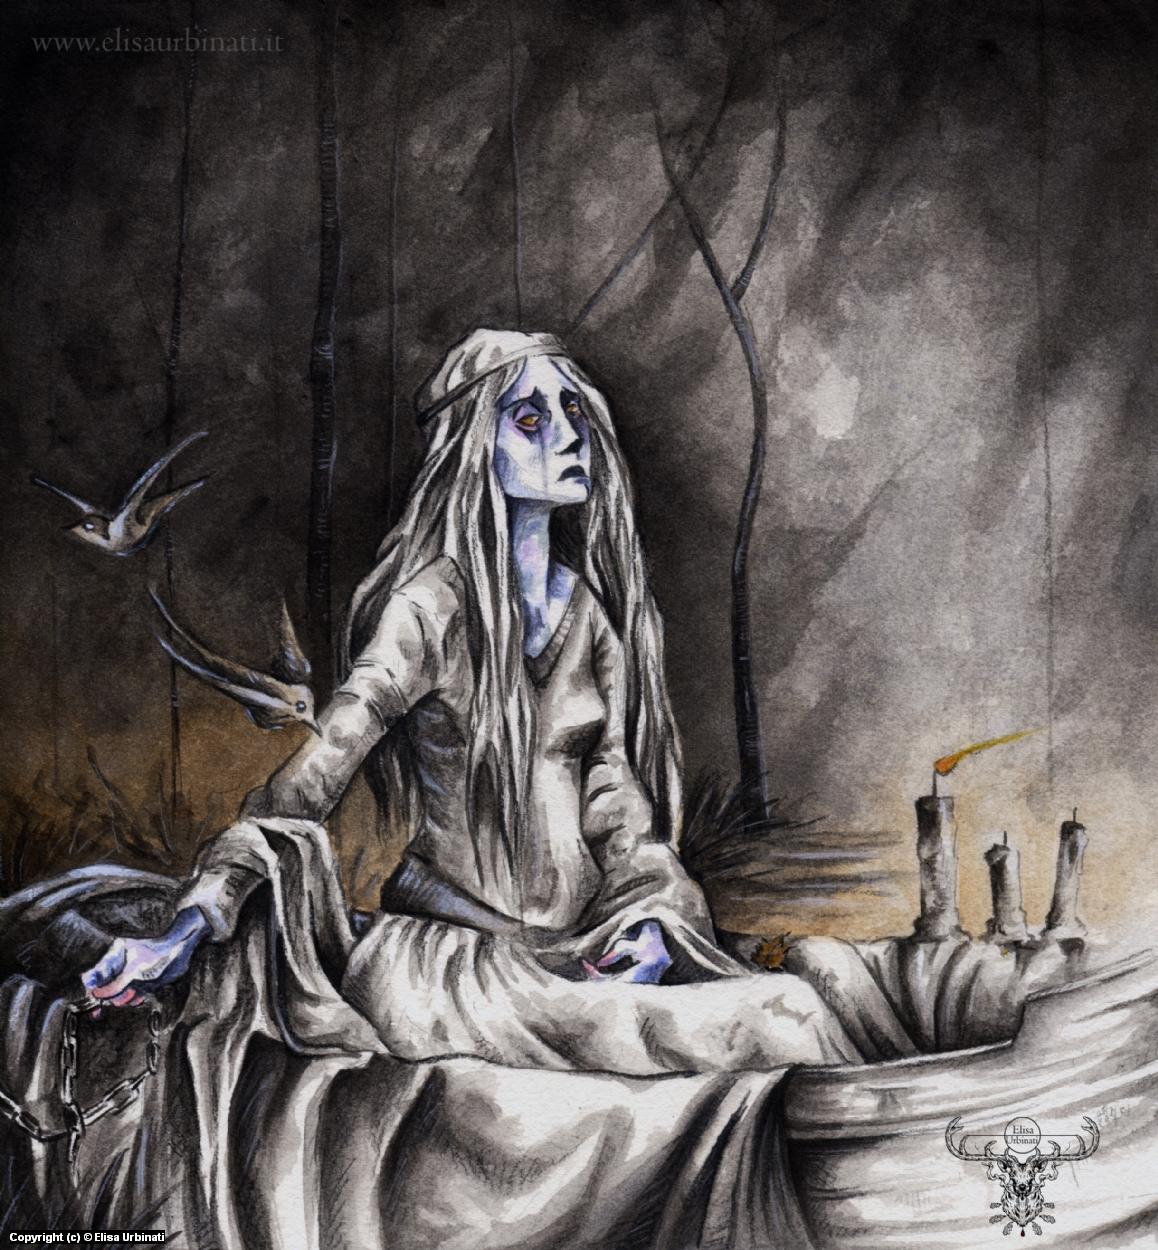 Lady of Shalott (Waterhouse tribute) Artwork by Elisa Urbinati